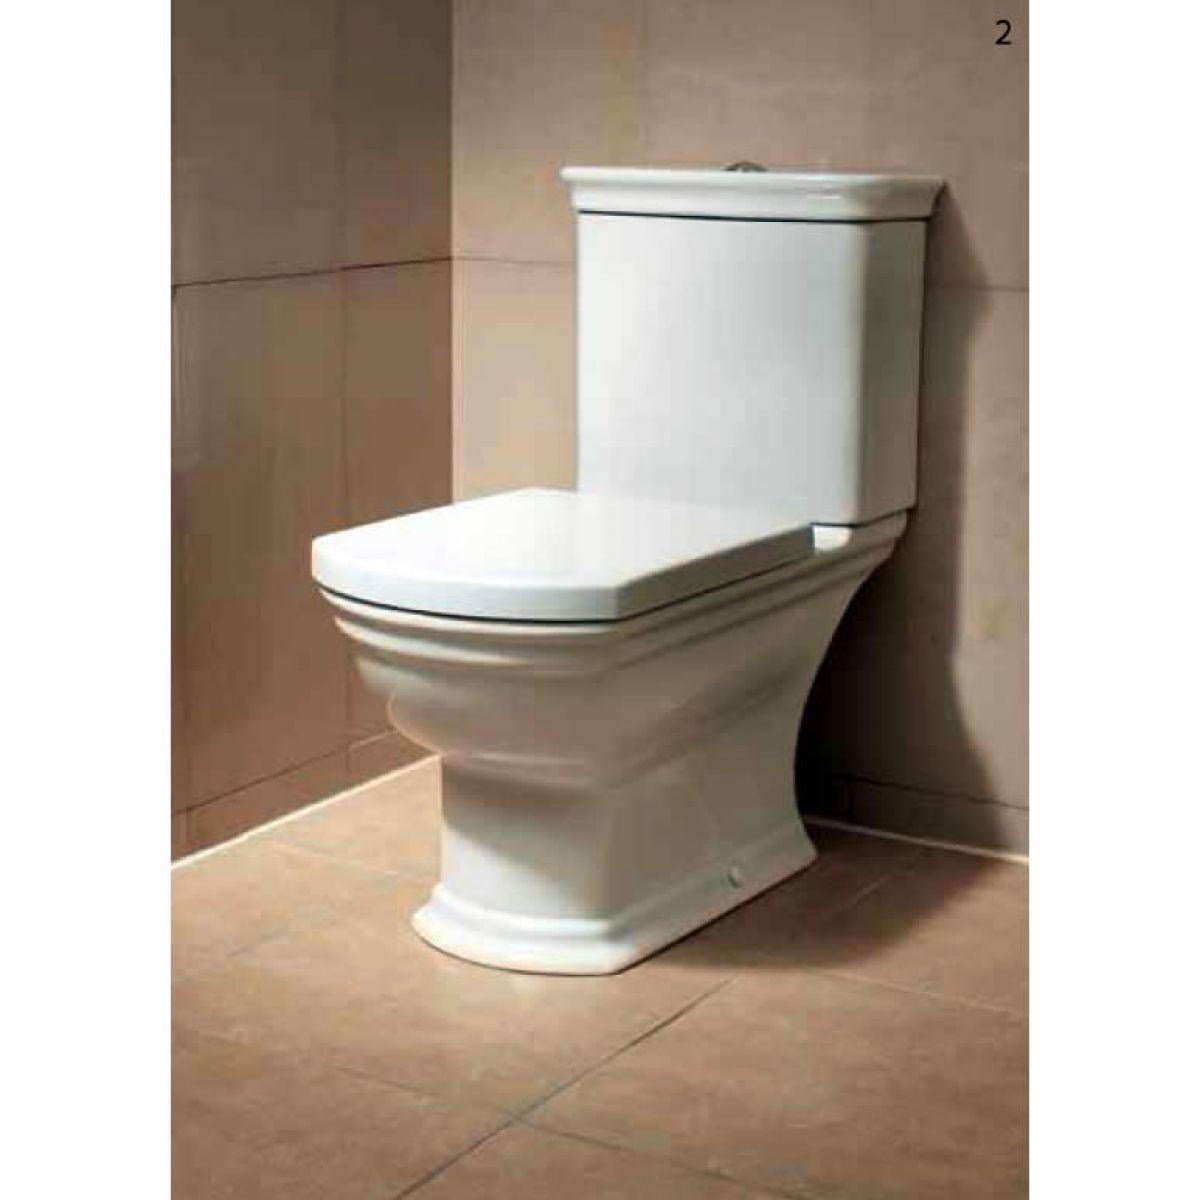 vitra serenada closed coupled toilet uk bathrooms. Black Bedroom Furniture Sets. Home Design Ideas